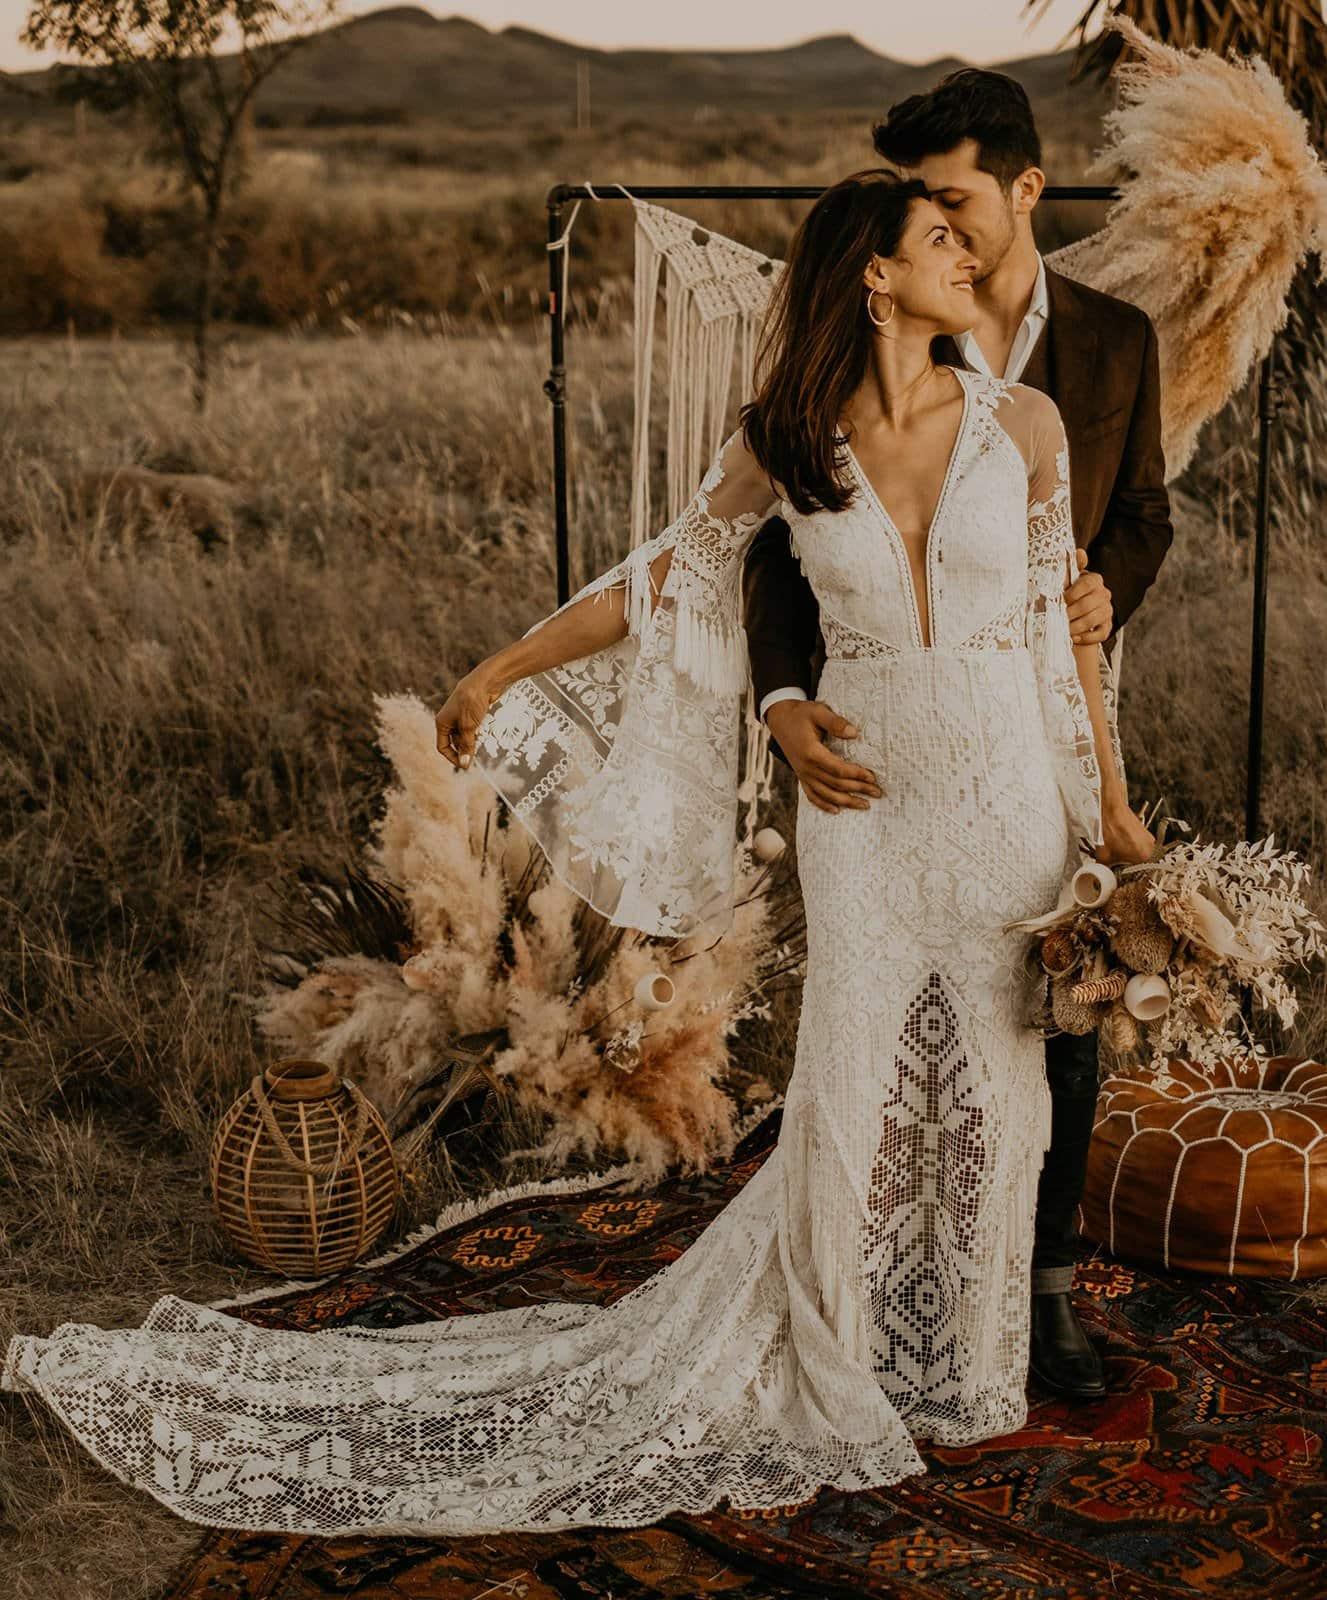 Boho bride and groom.